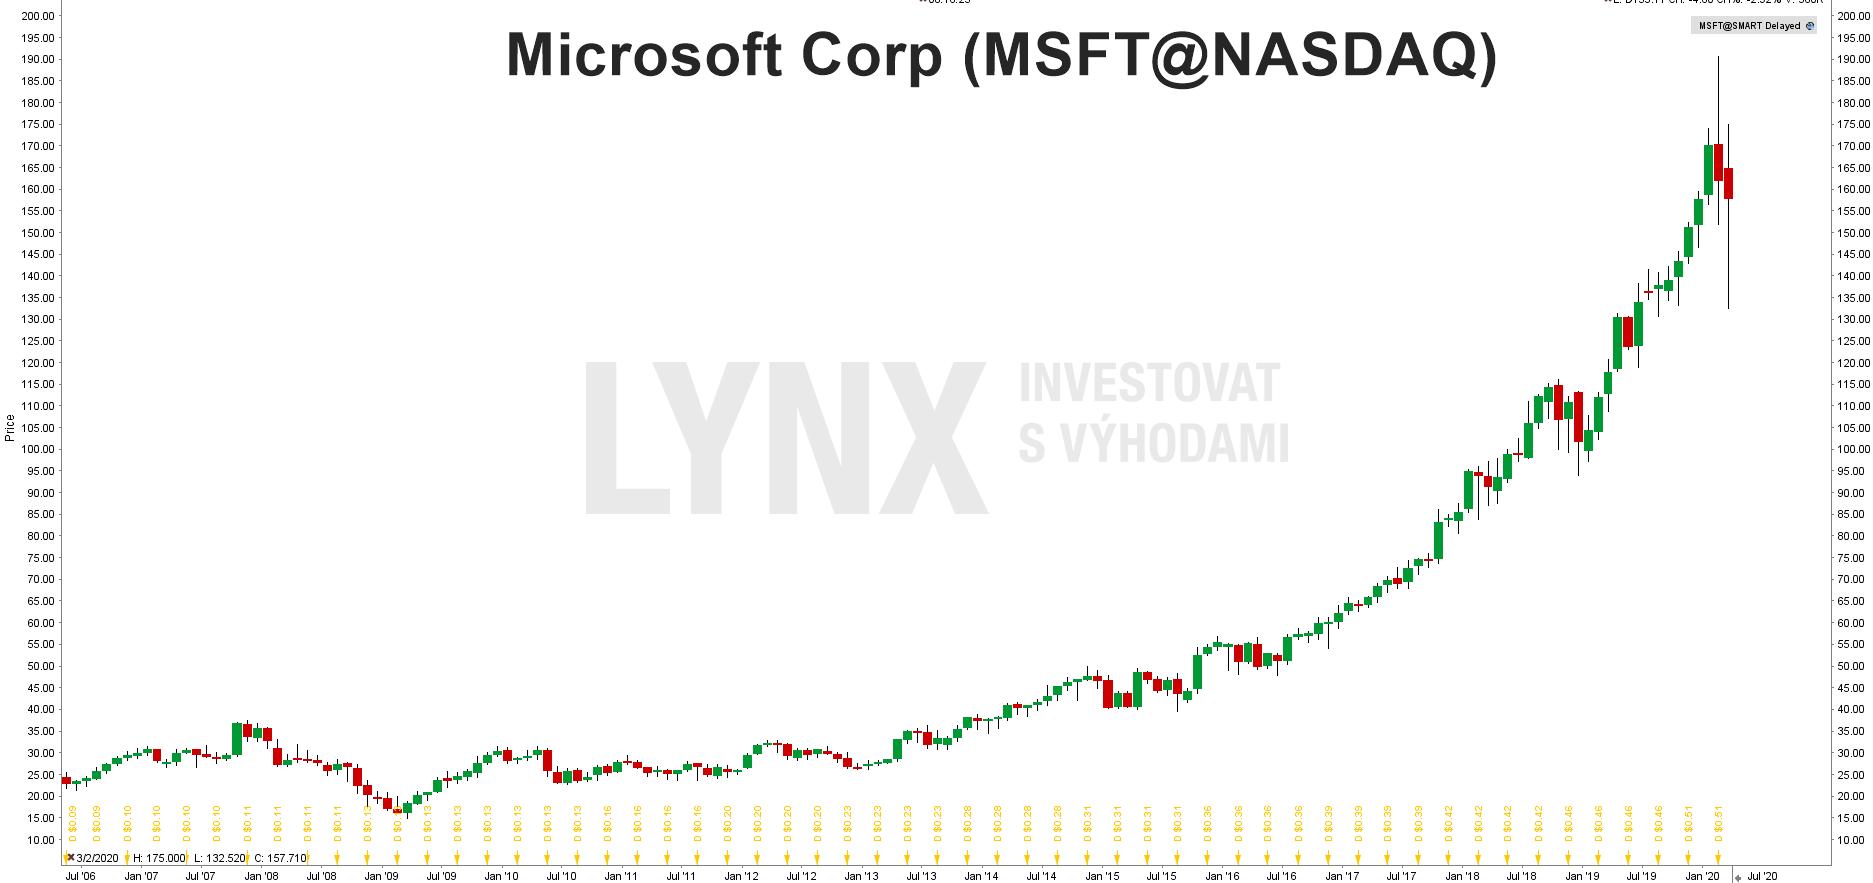 Graf akcie Microsoft (MSFT)